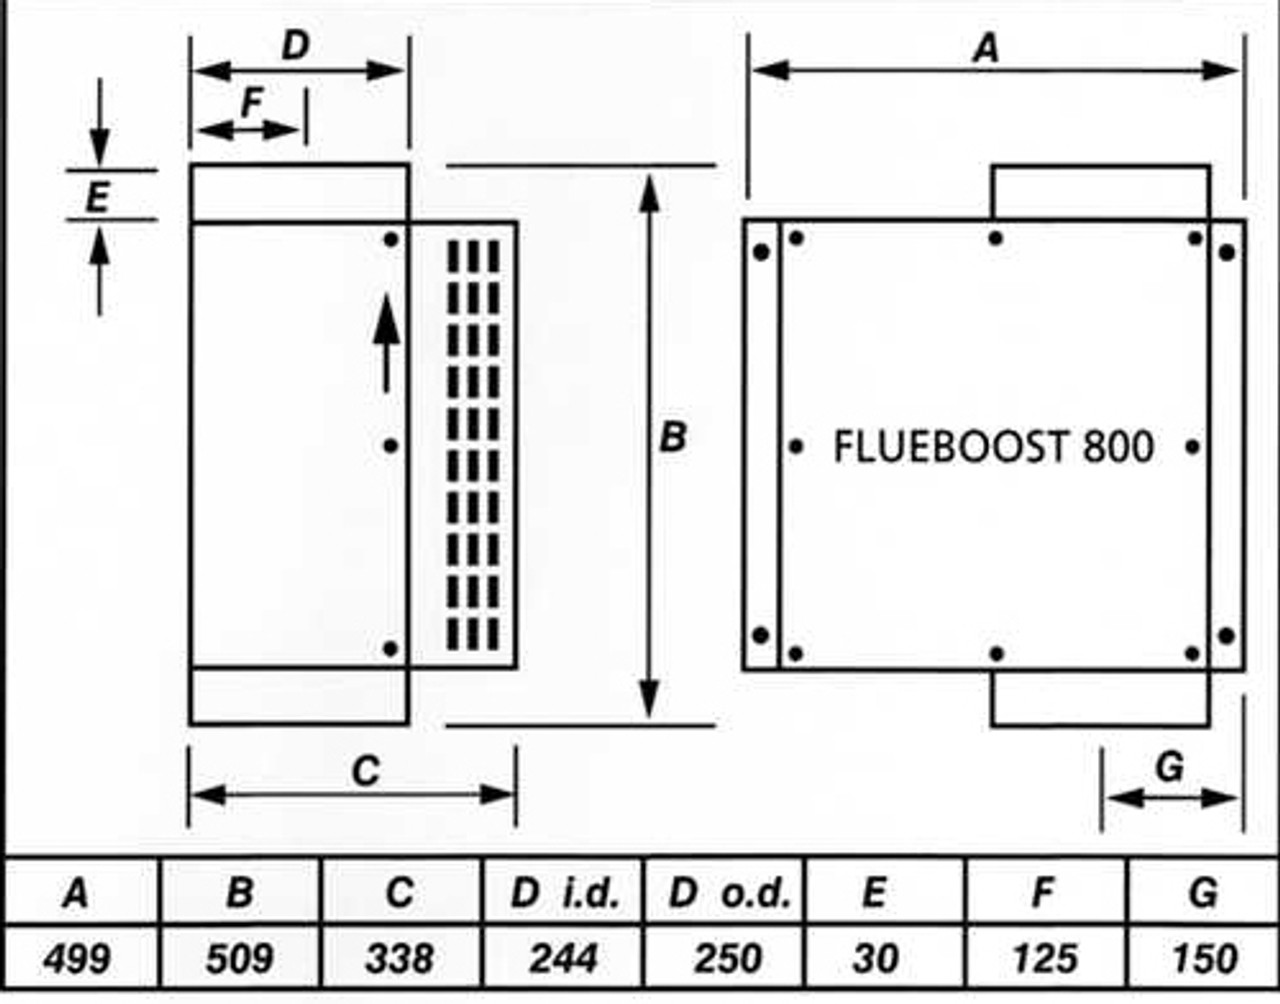 Flueboost 800